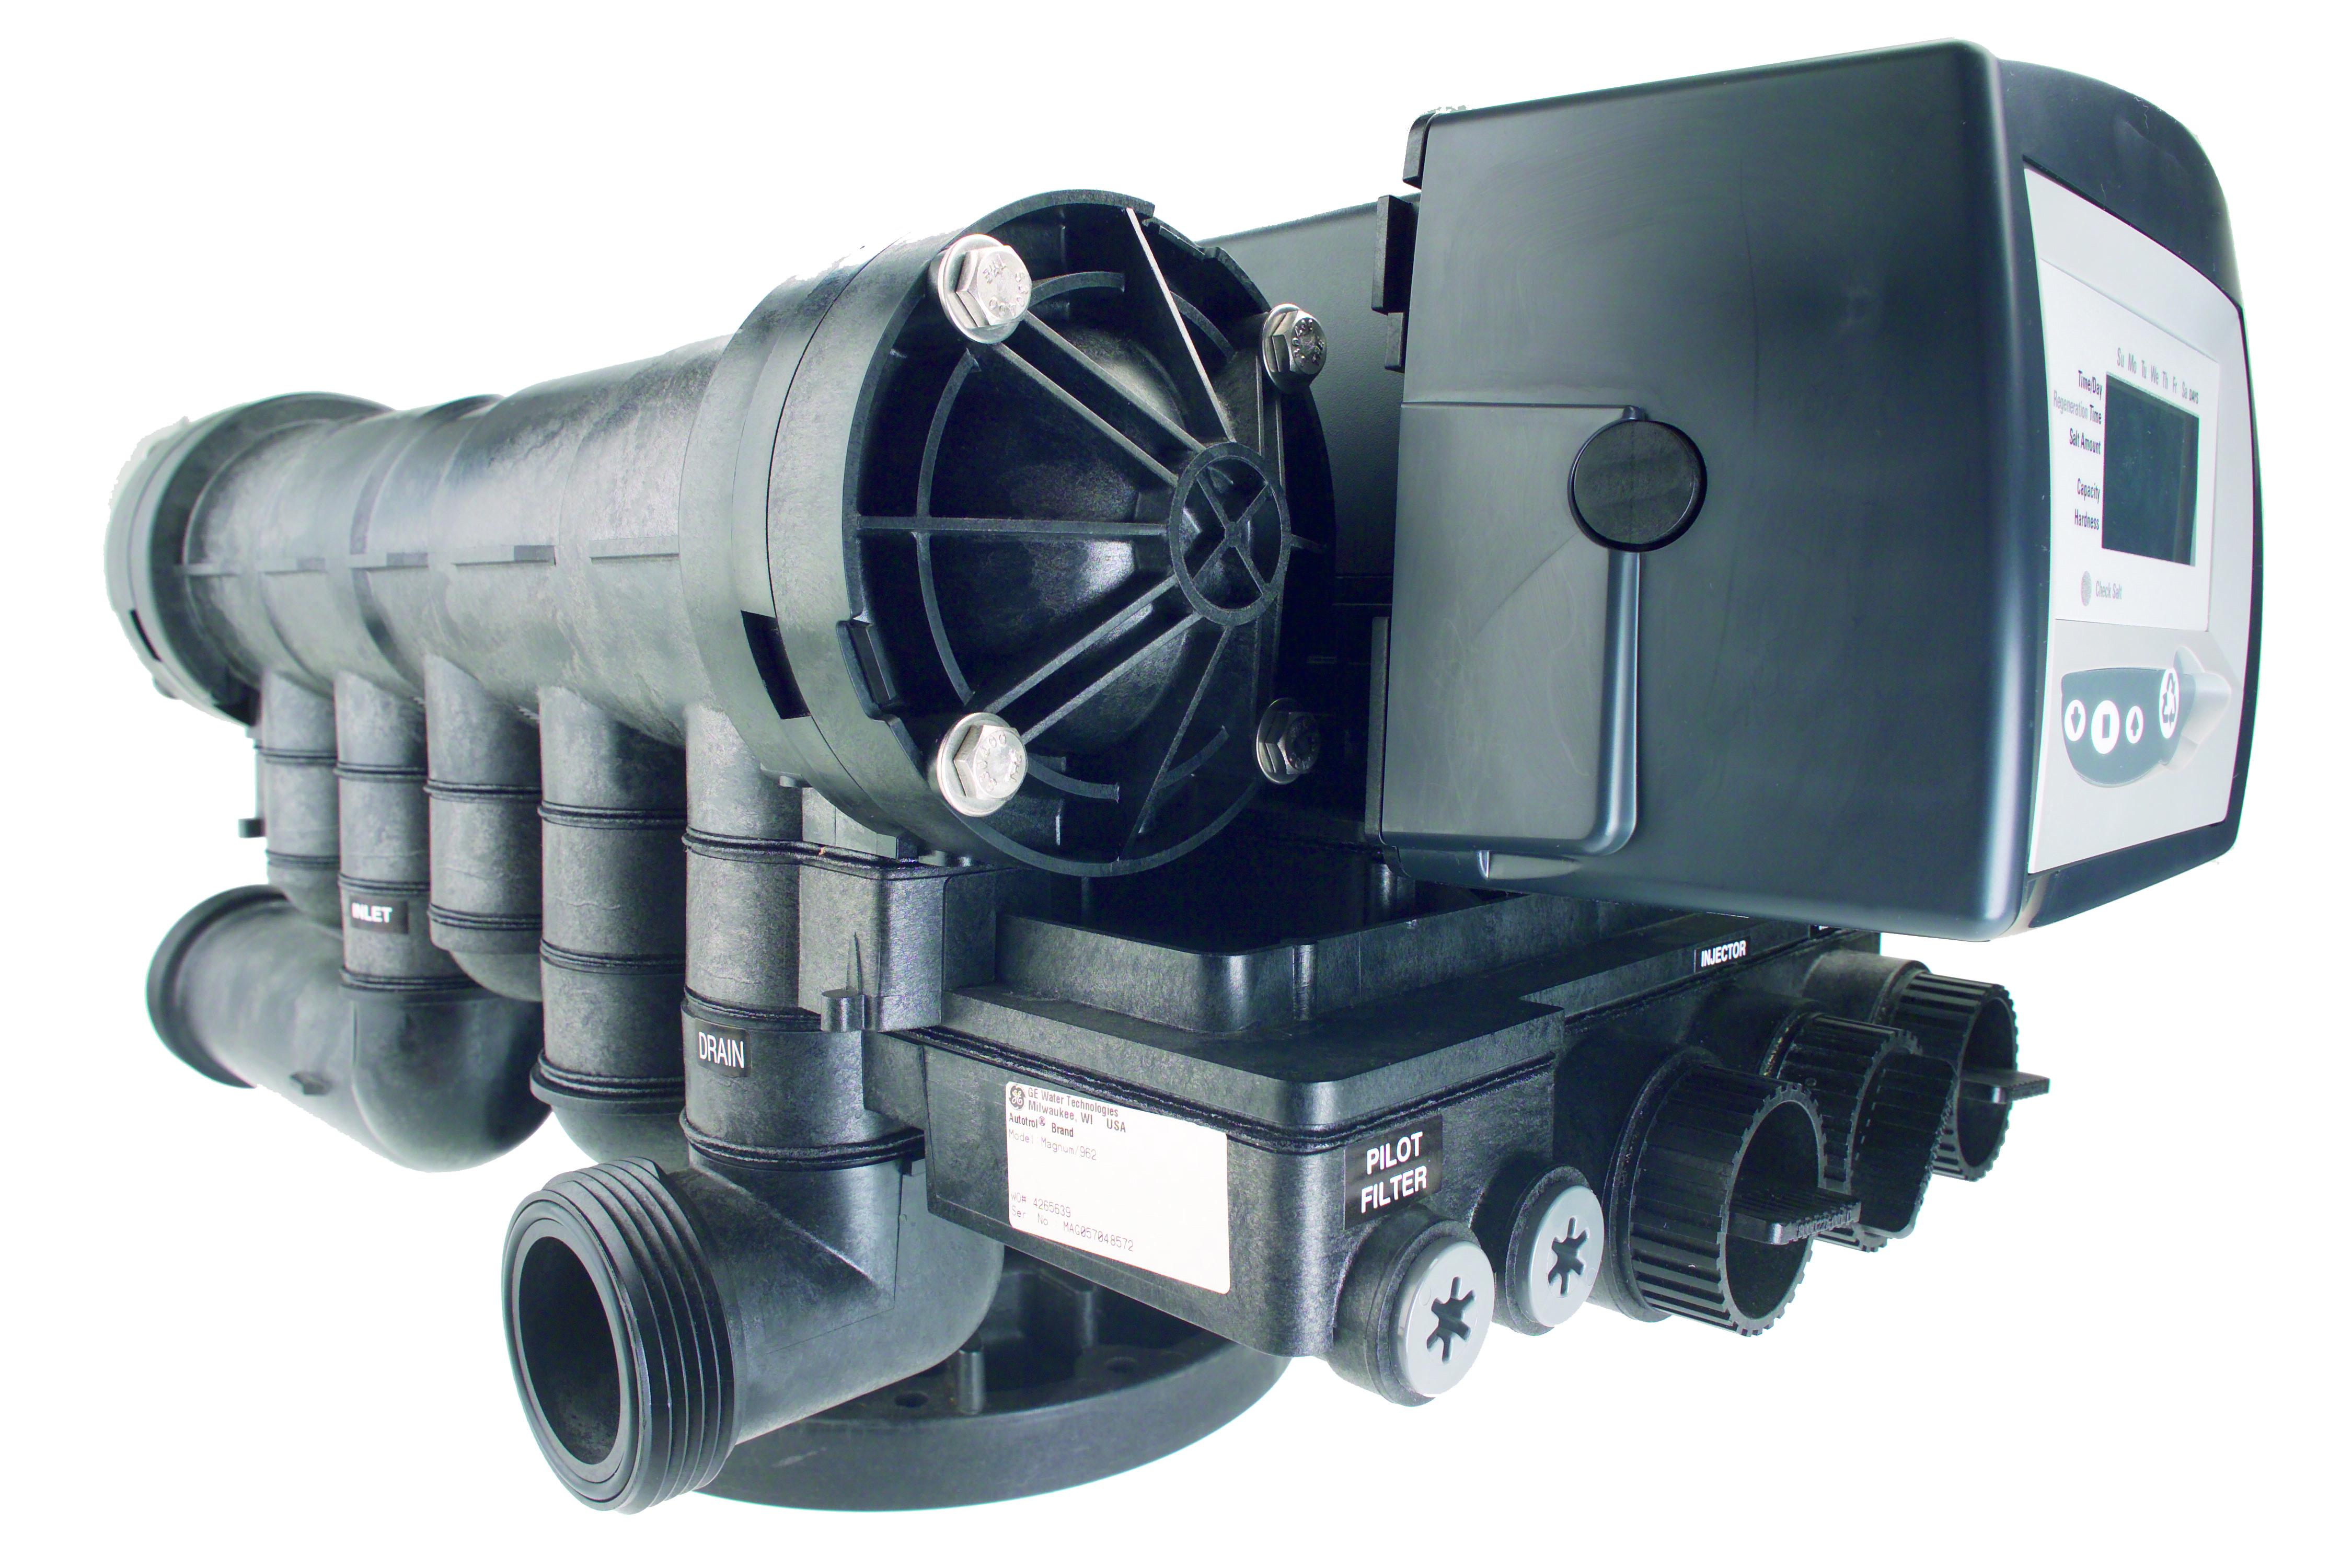 Water Softener  Autotrol Water Softener 255 Manual